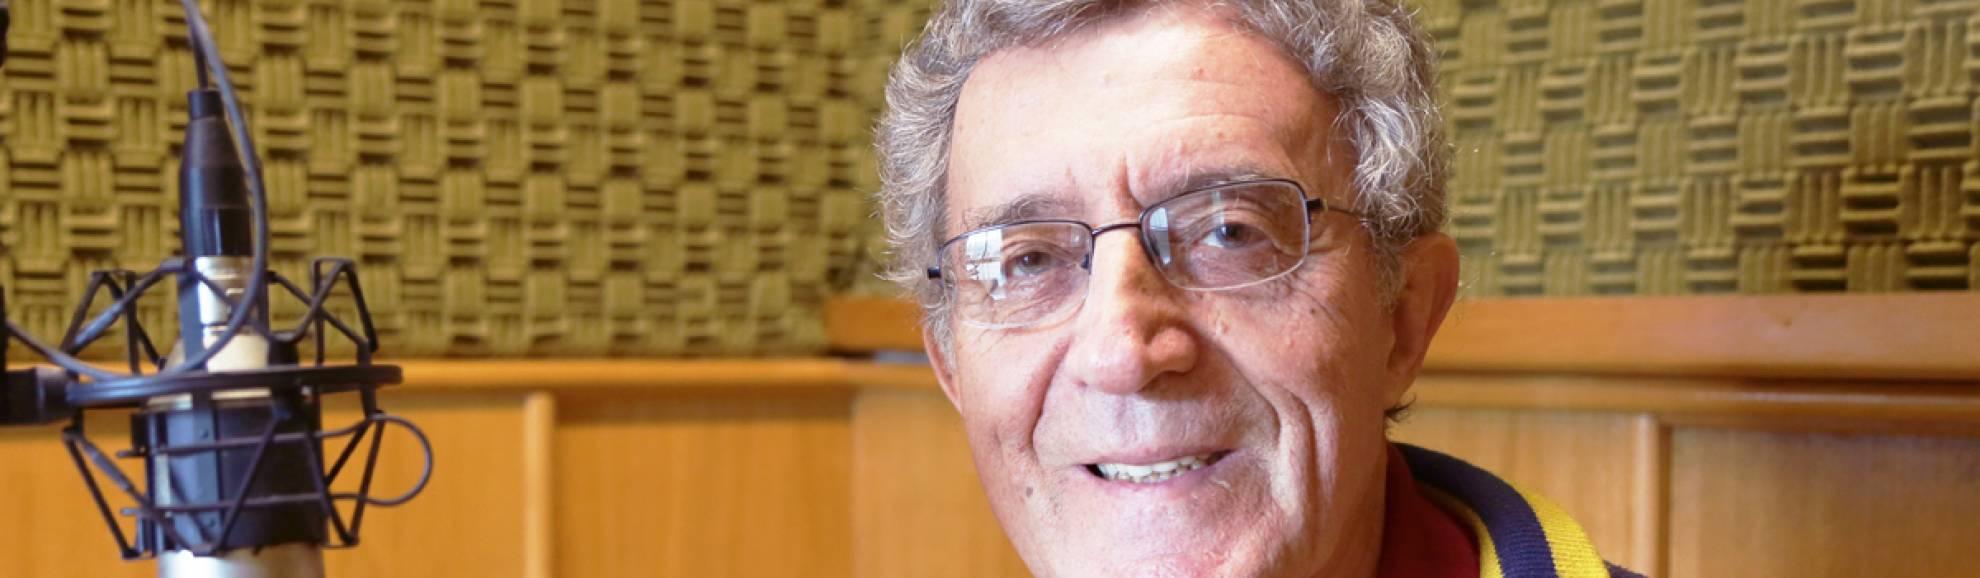 Frei Luiz Favaron (Arquivo MI)